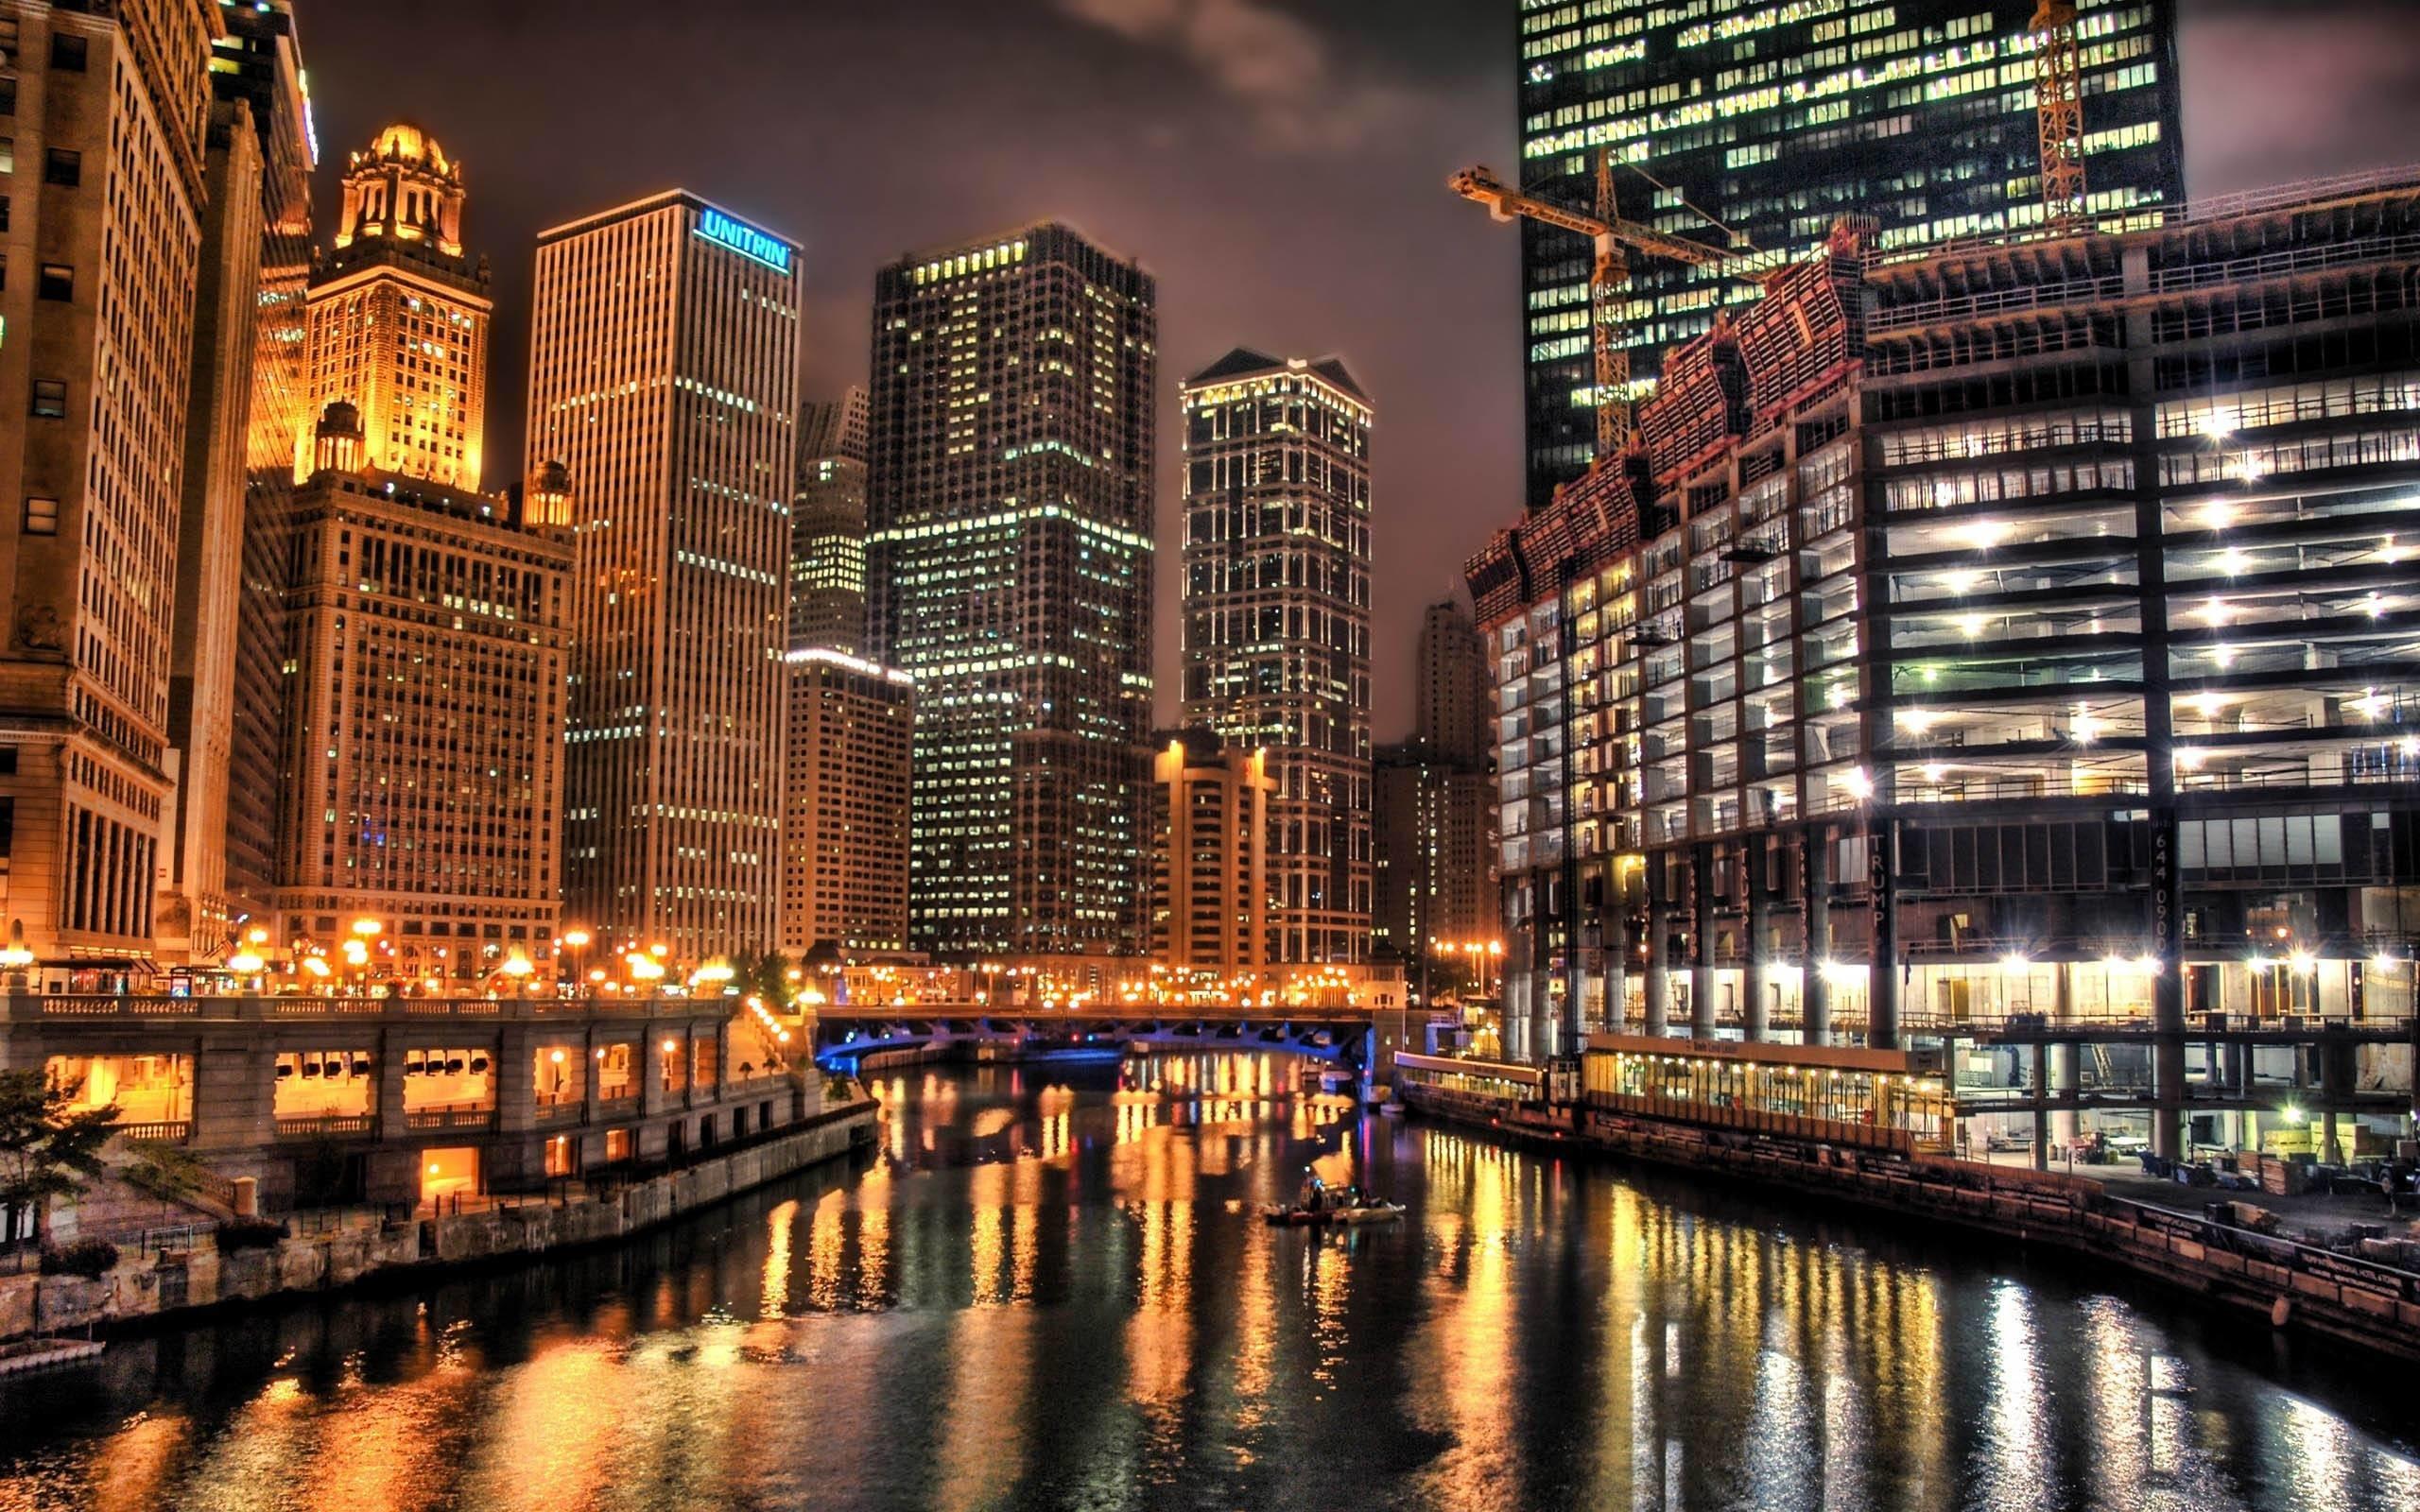 City Lights Background Wallpaper (61+ images)